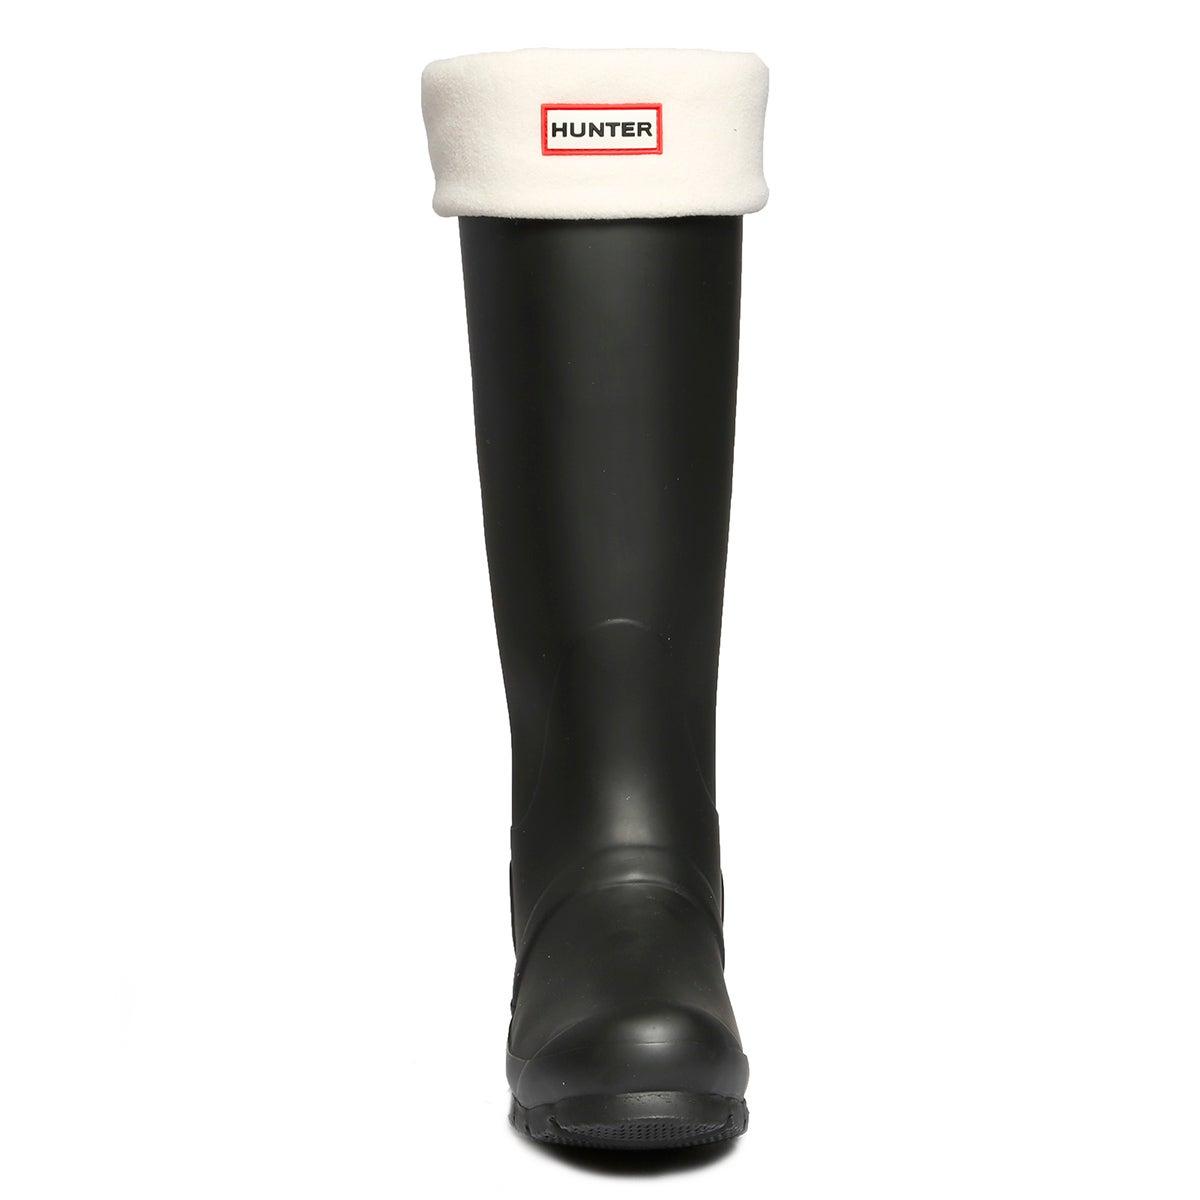 Lds Boot Sock cream sock